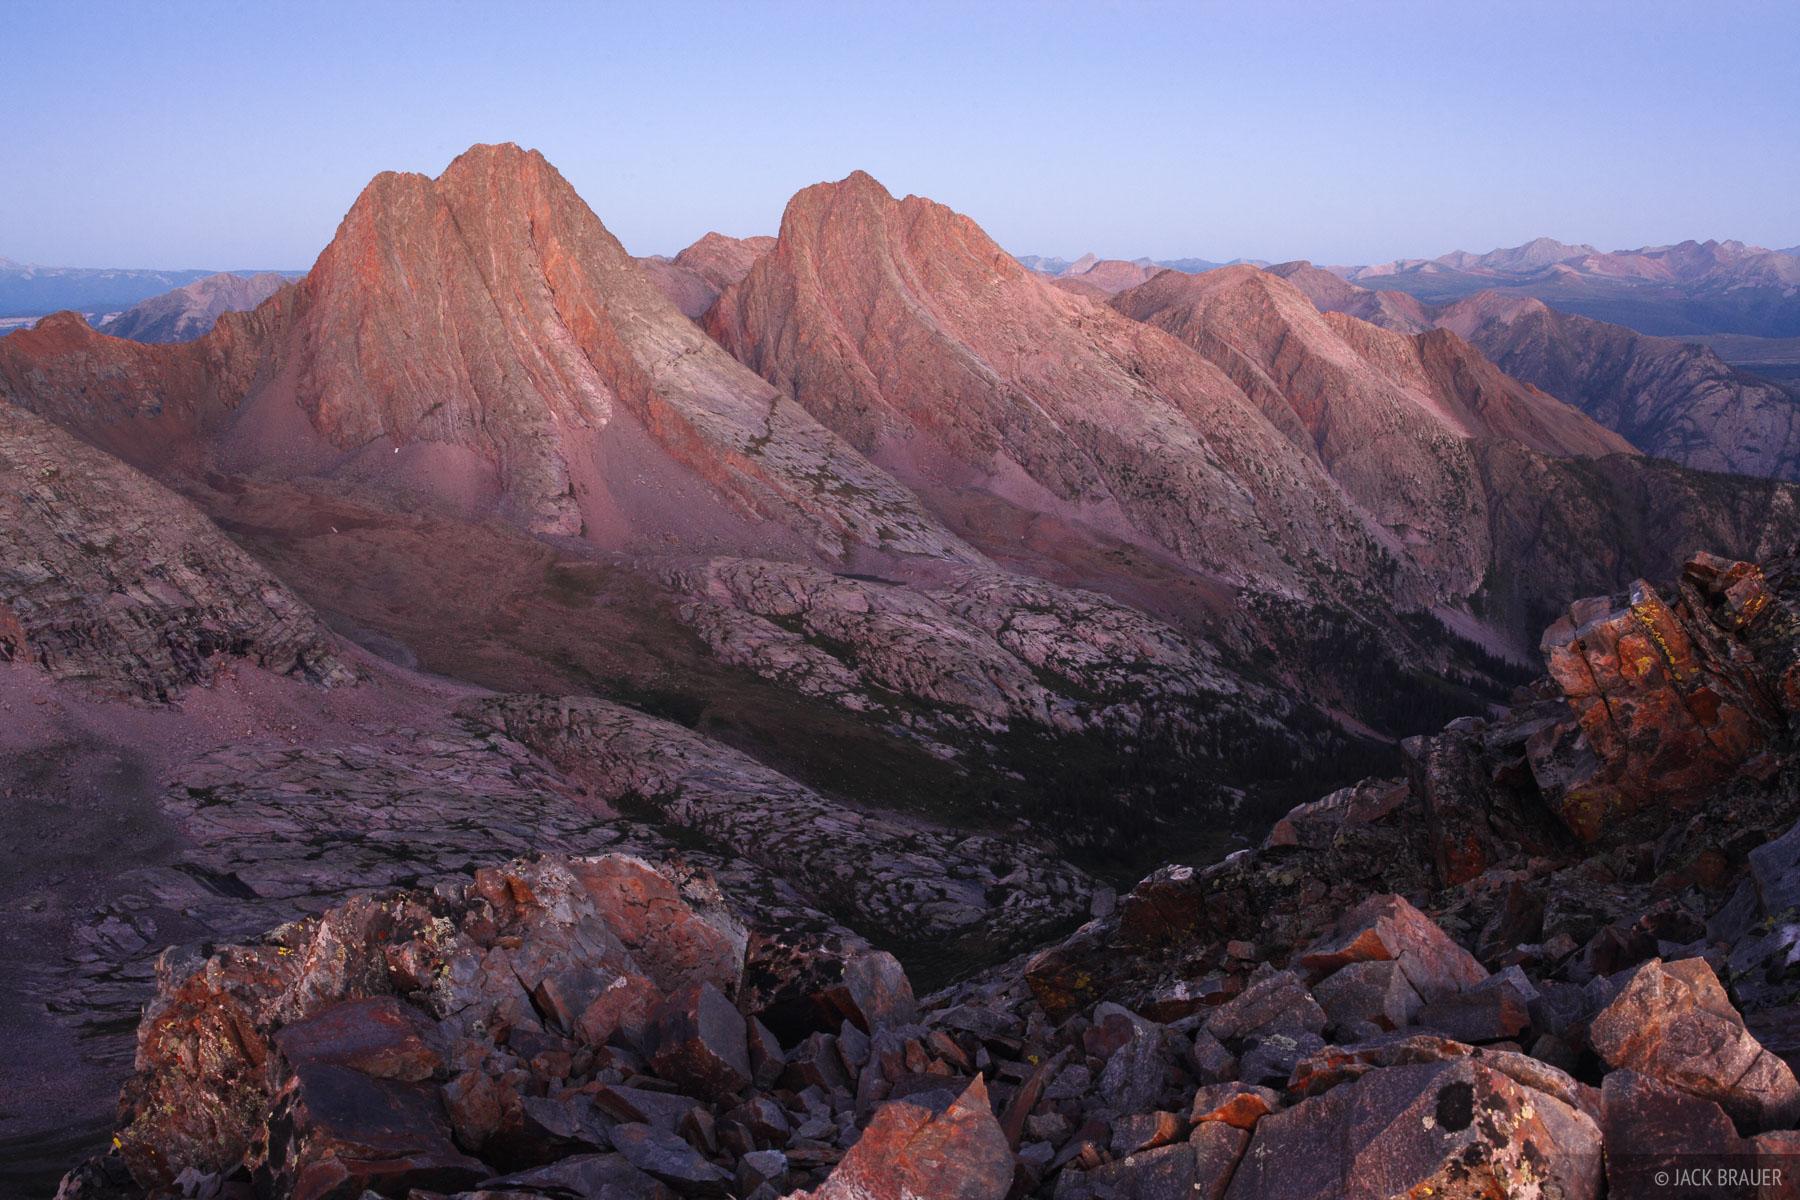 Grenadier Range, Vestal, Arrow Peak, Weminuche Wilderness, San Juan Mountains, Colorado, photo